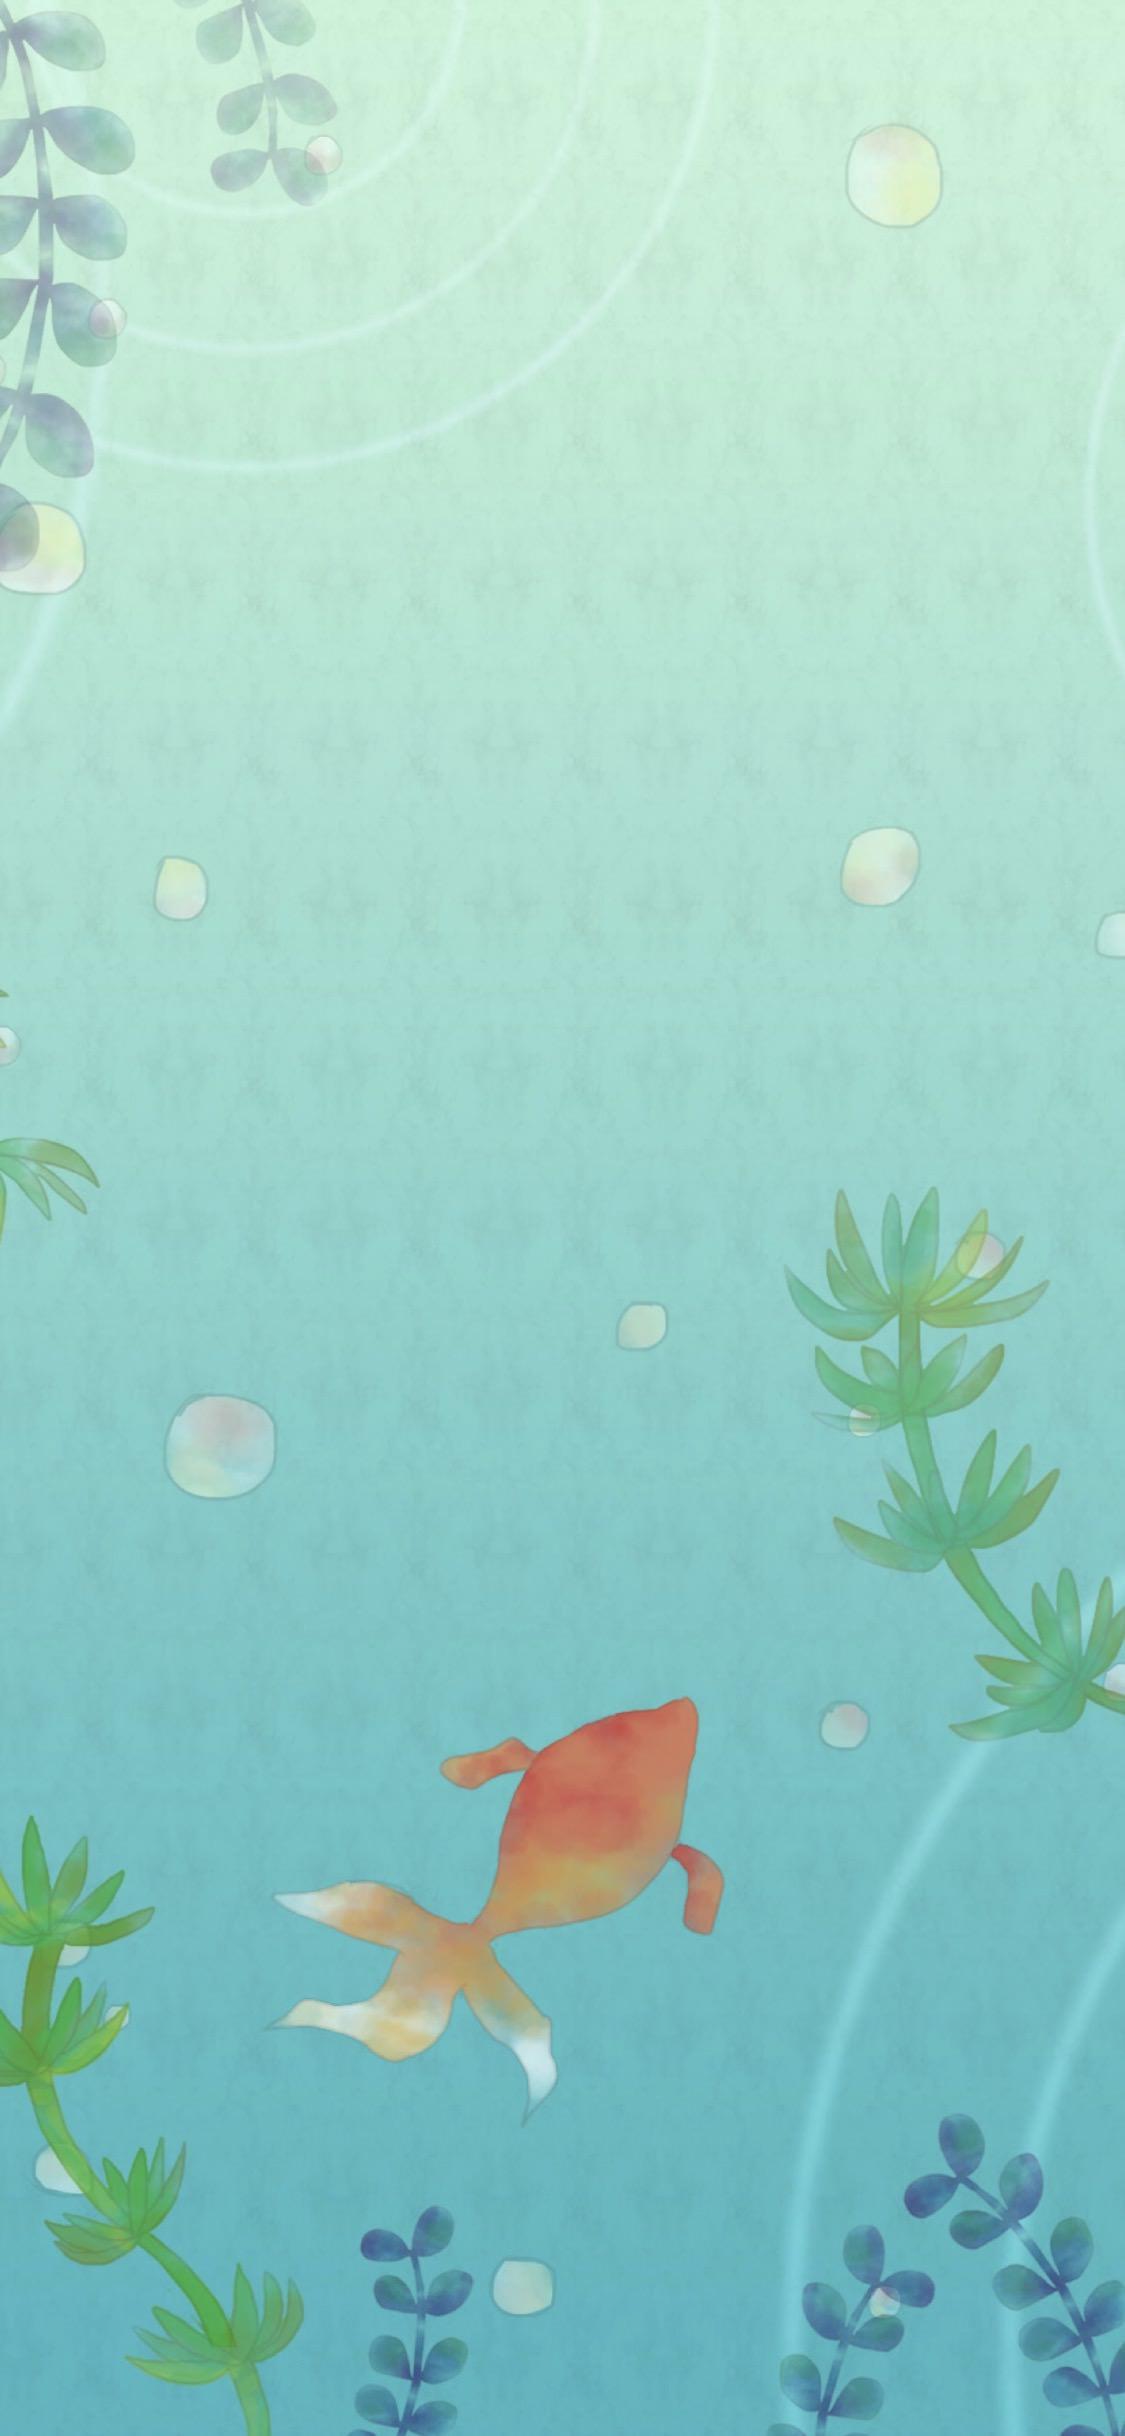 iPhone X 壁紙 wallpaper 1065